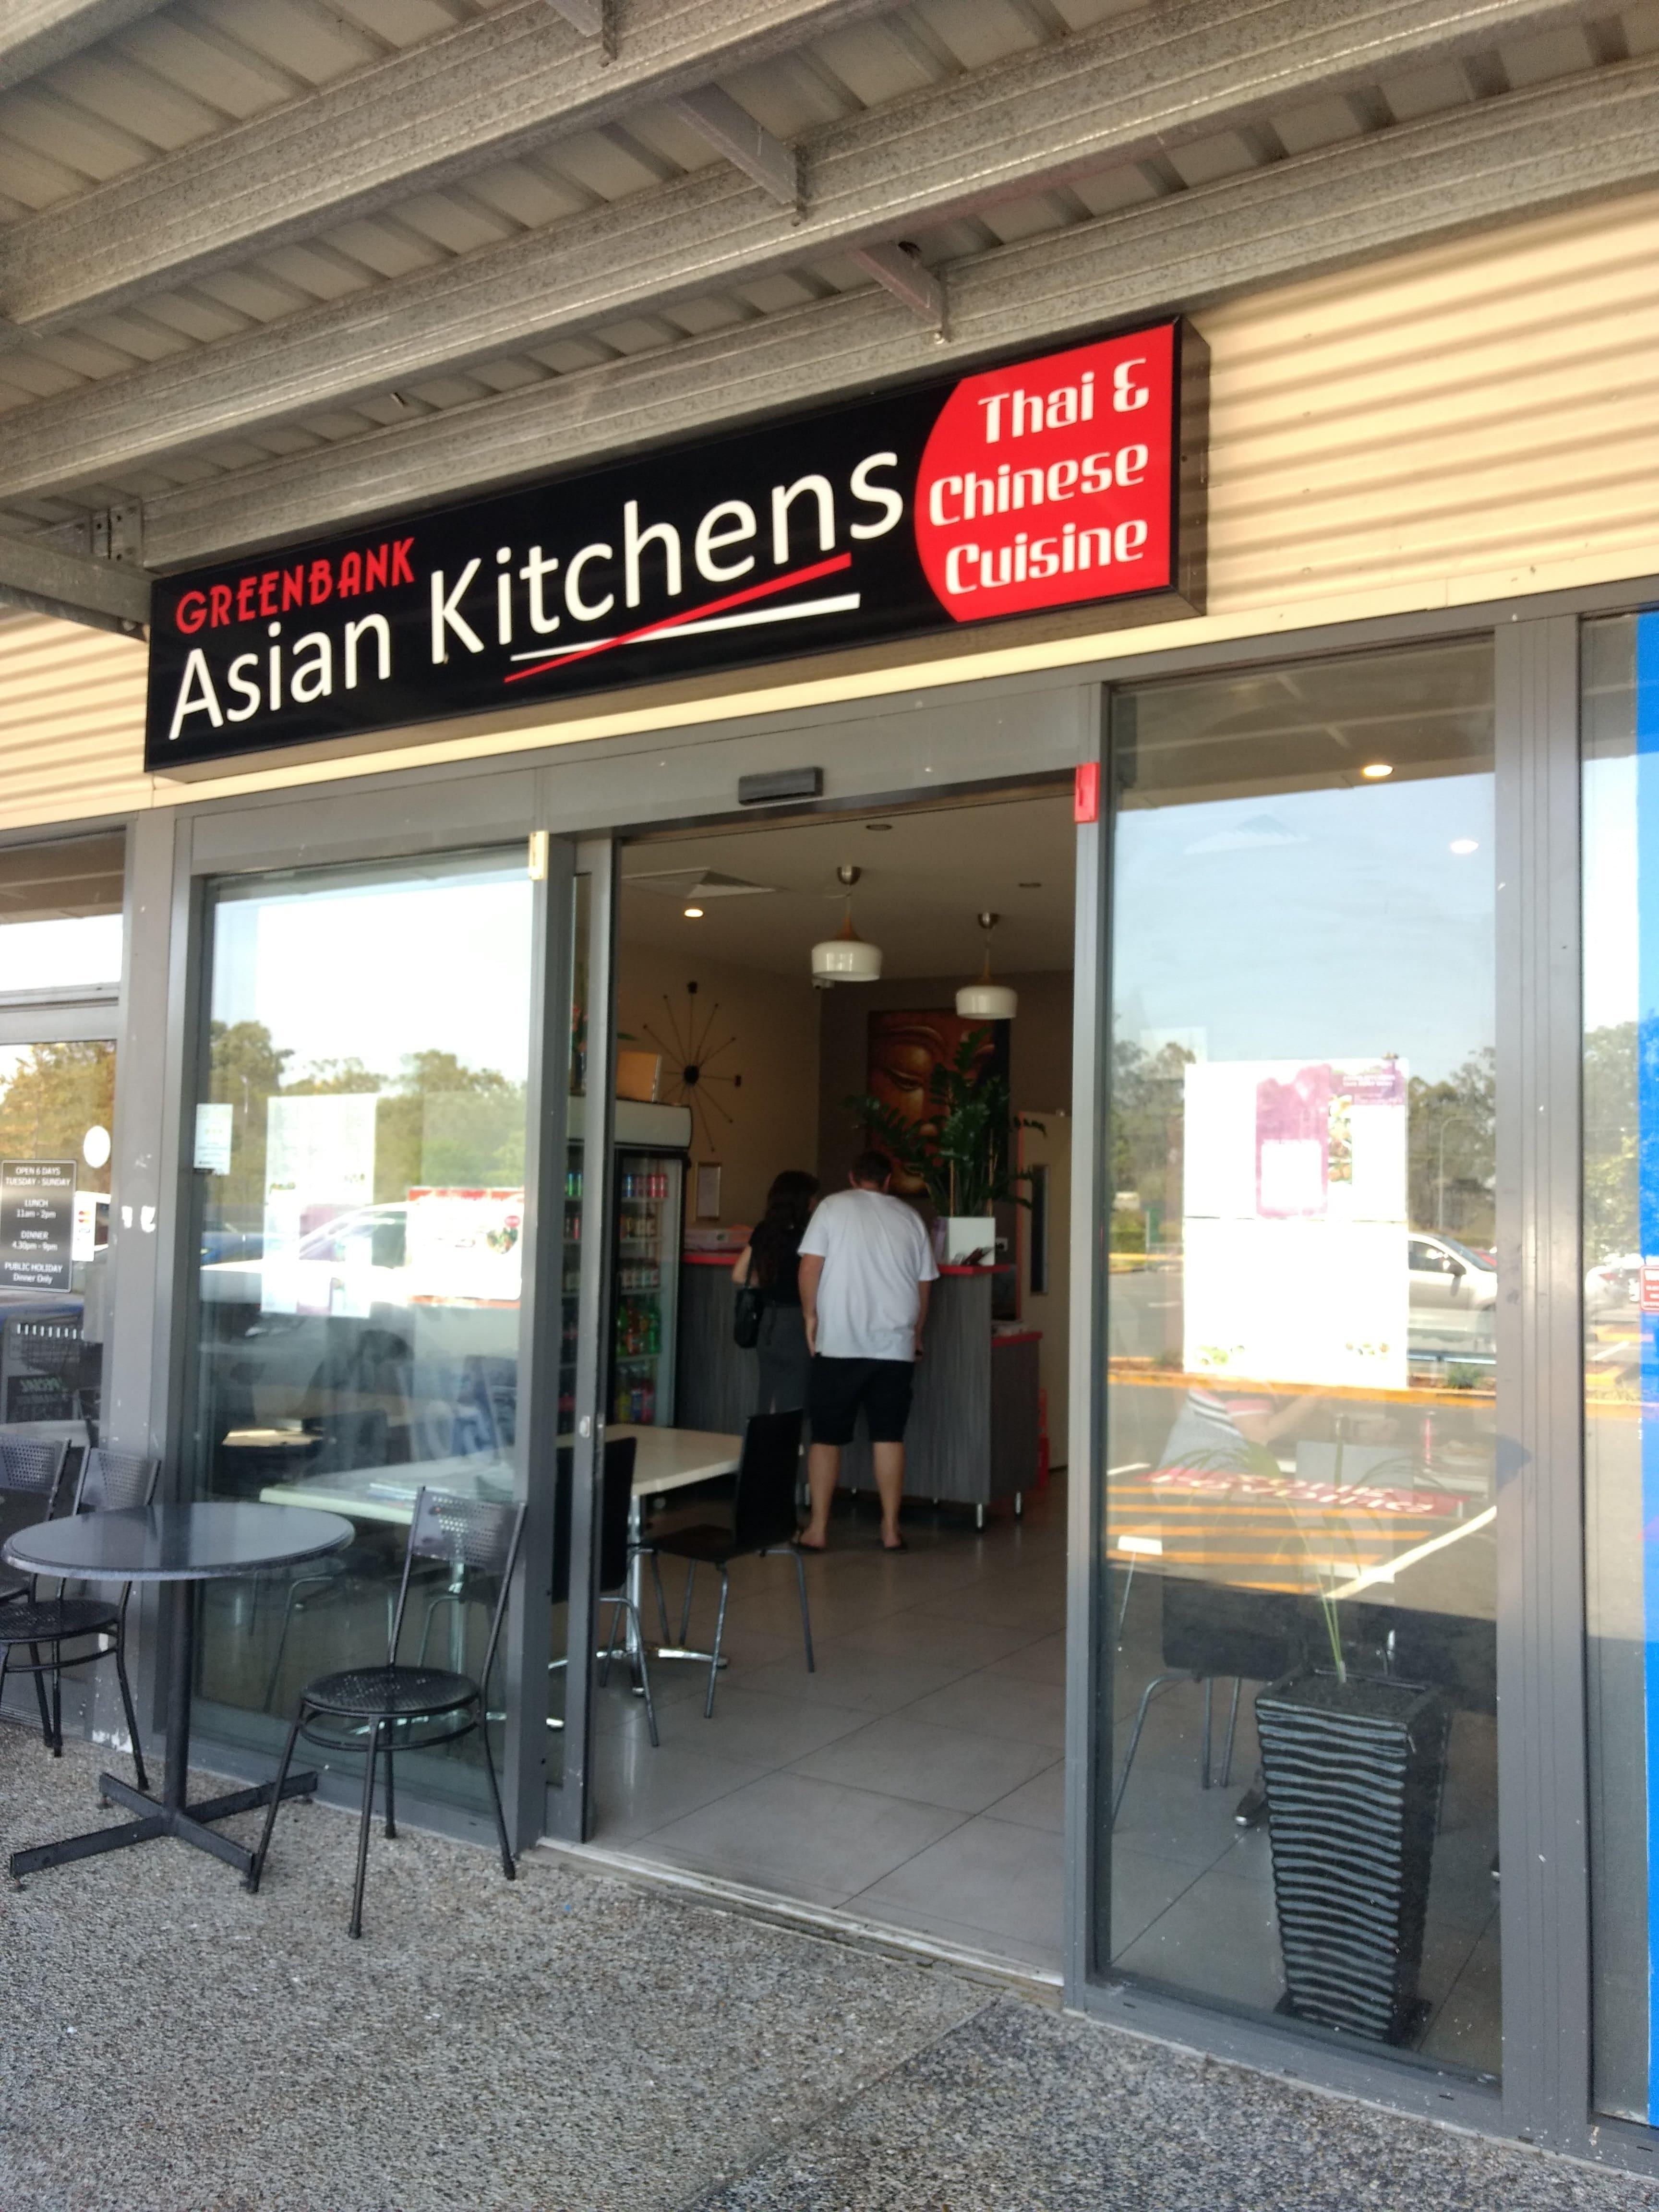 Greenbank Asian Kitchens Menu Menu For Greenbank Asian Kitchens Greenbank Brisbane